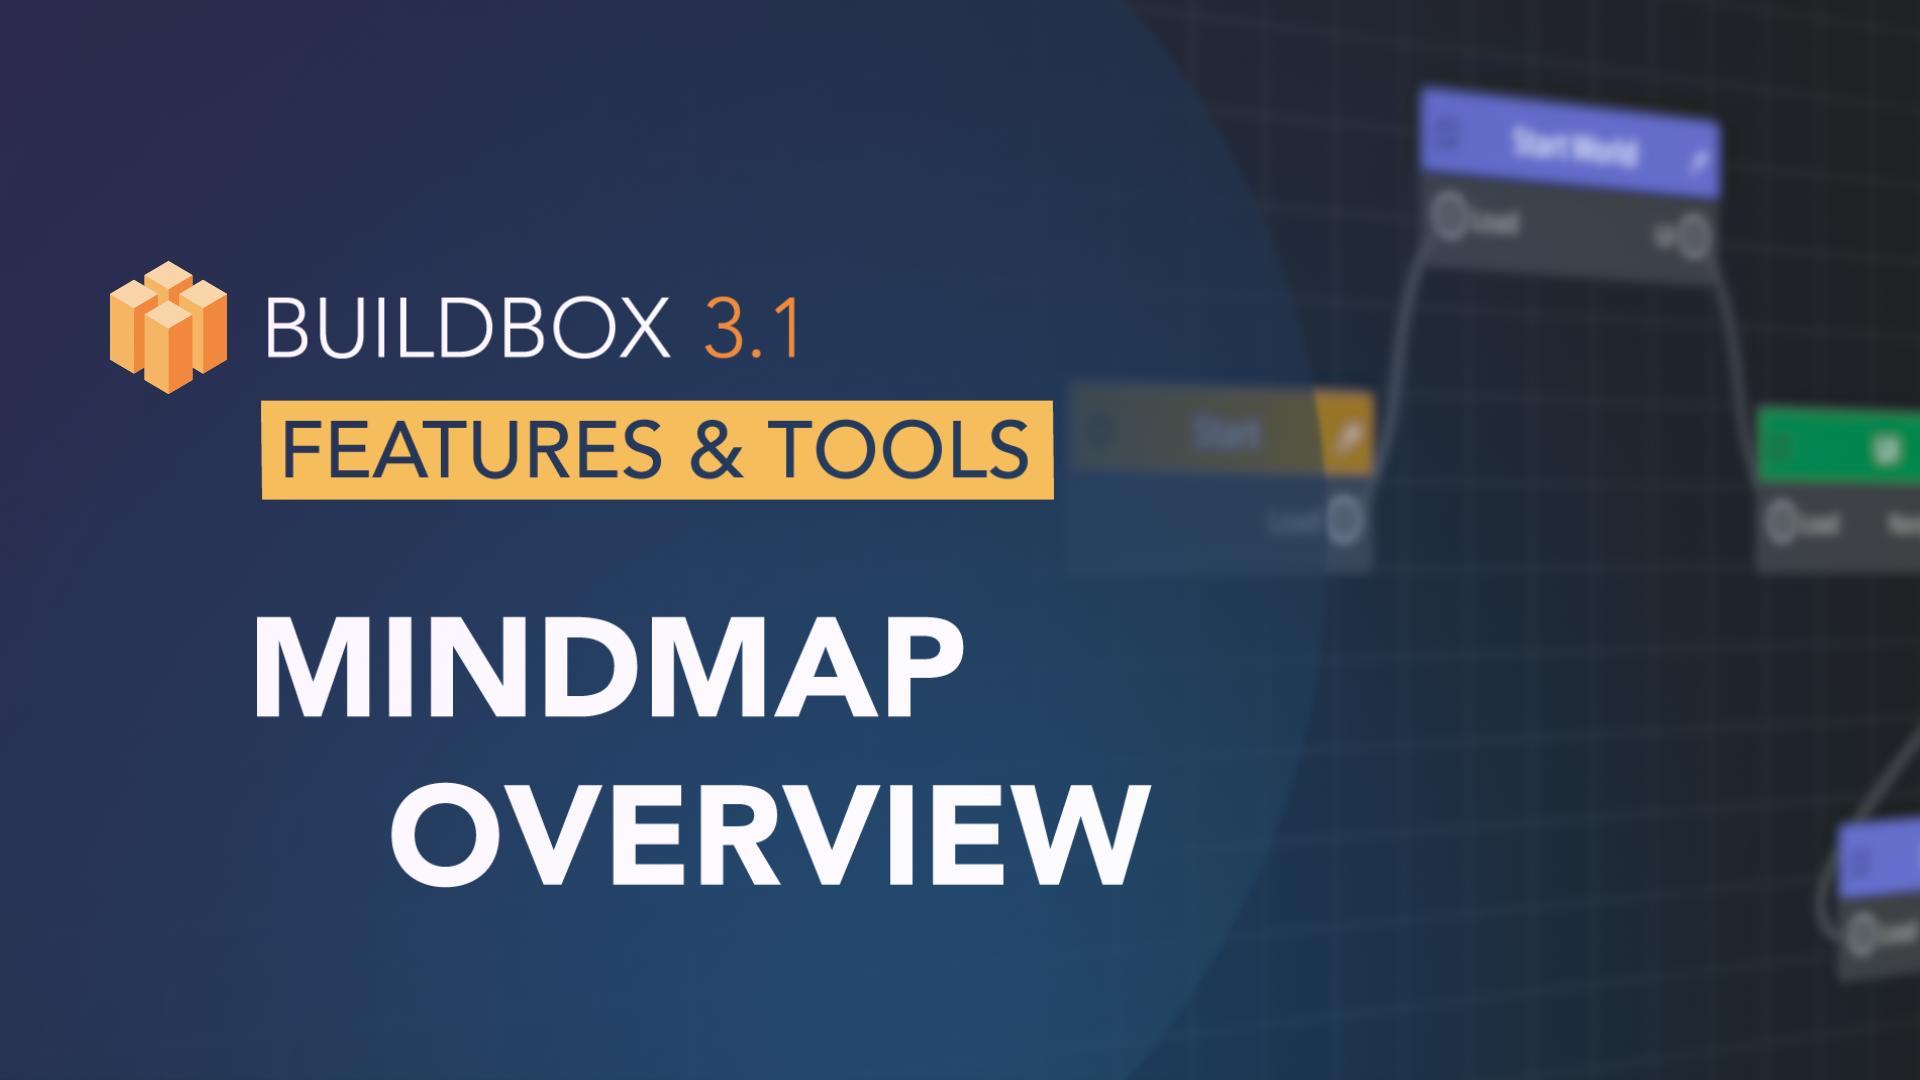 Mindmap Overview